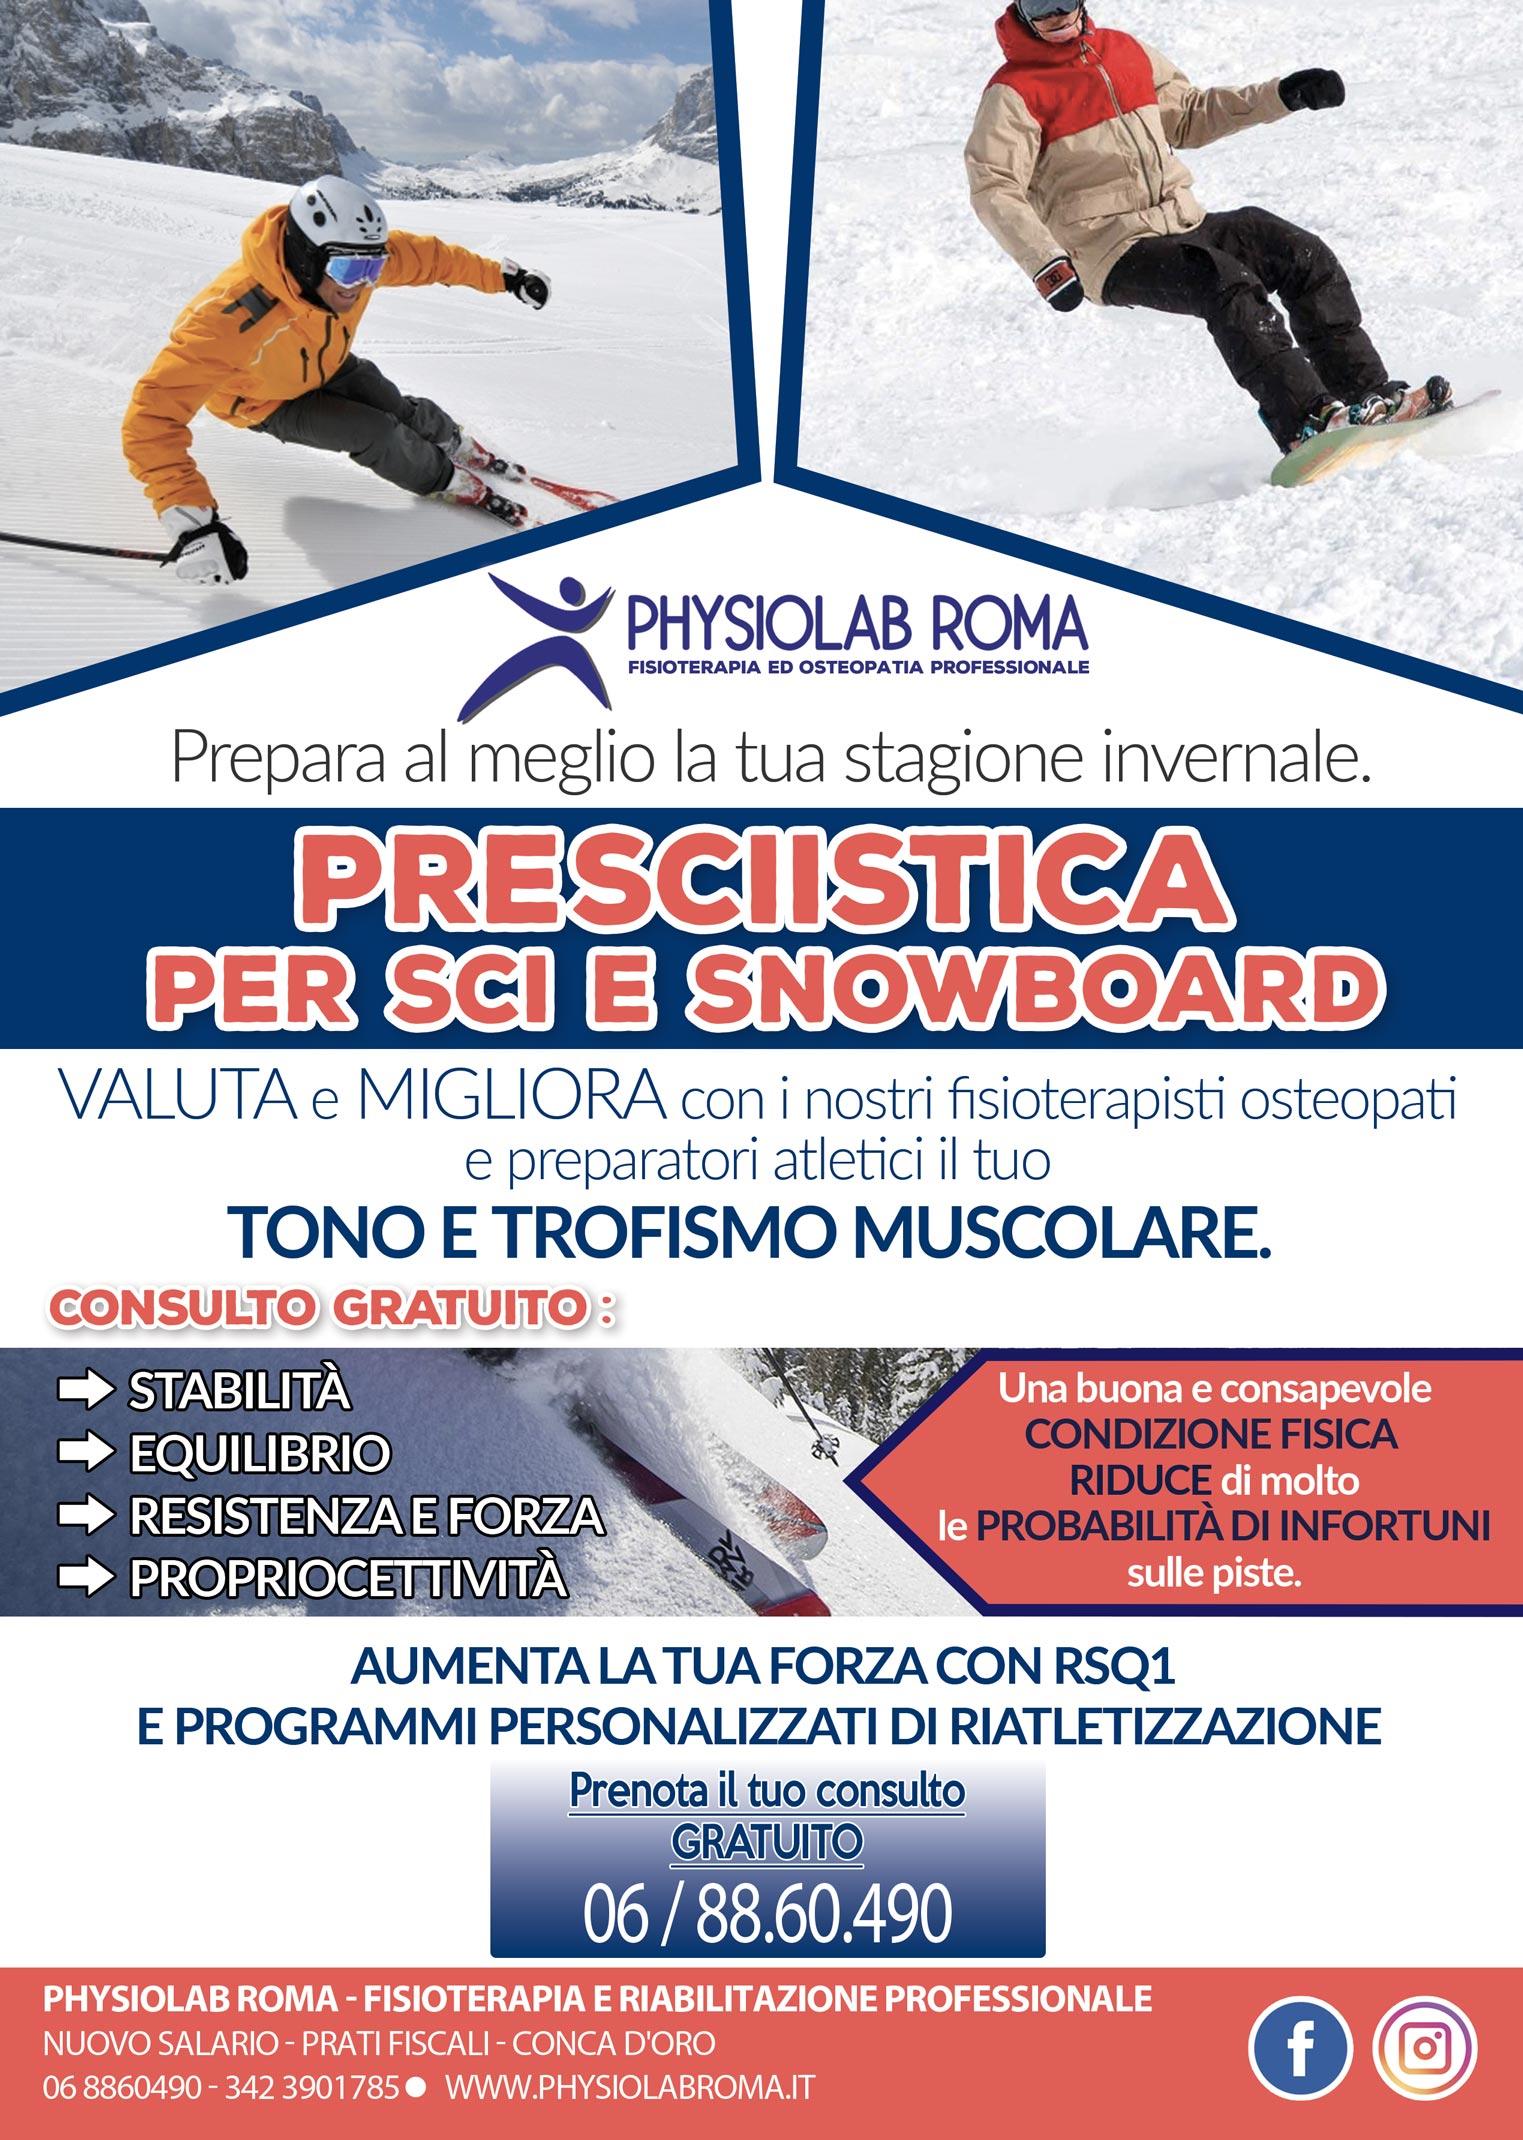 Studio Fisioterapia Roma Physiolab Roma